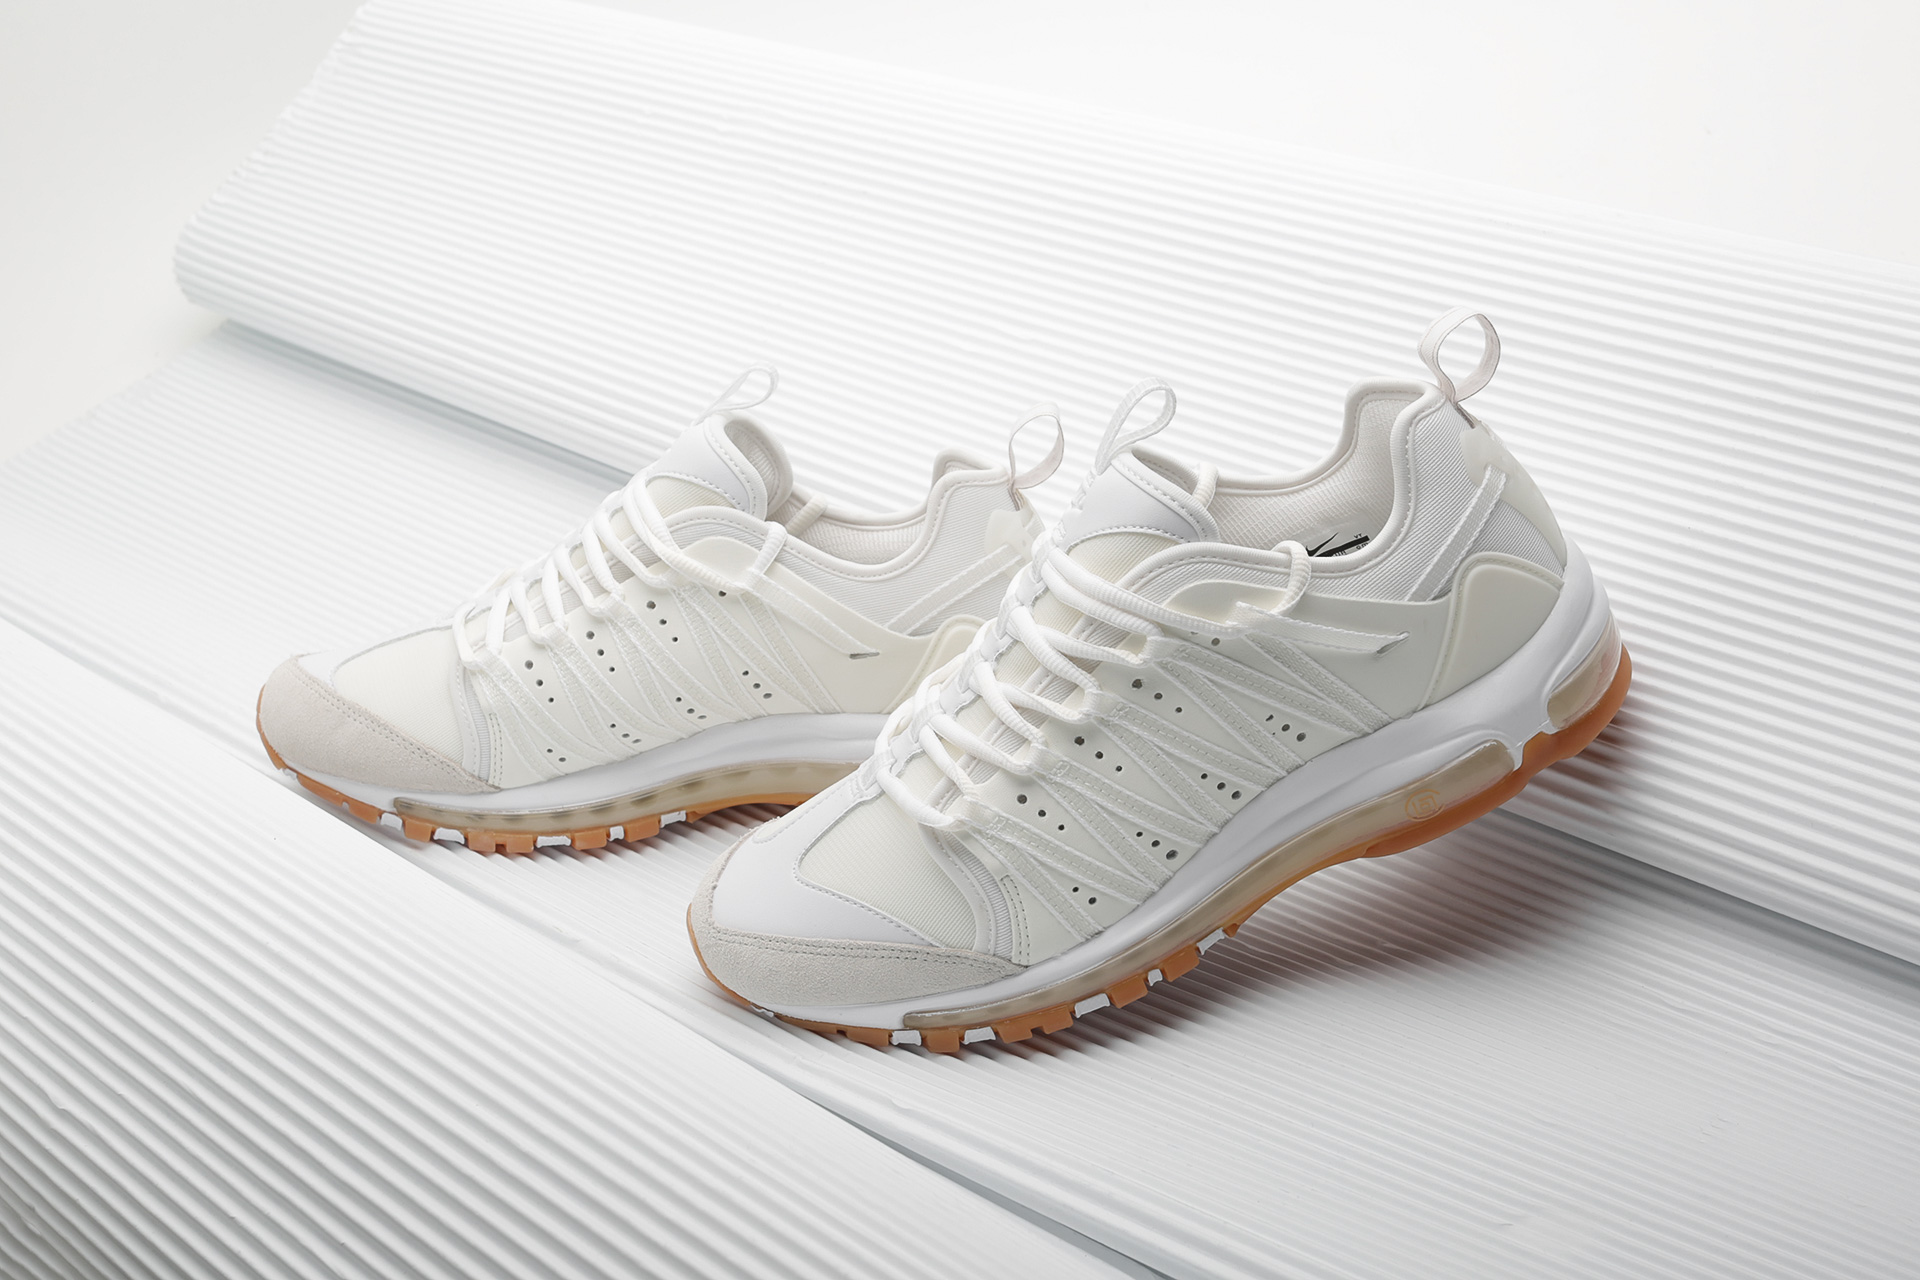 5beaa155 ... Купить мужские белые кроссовки Nike Air Max 97 / Haven / Clot - фото 5  картинки ...